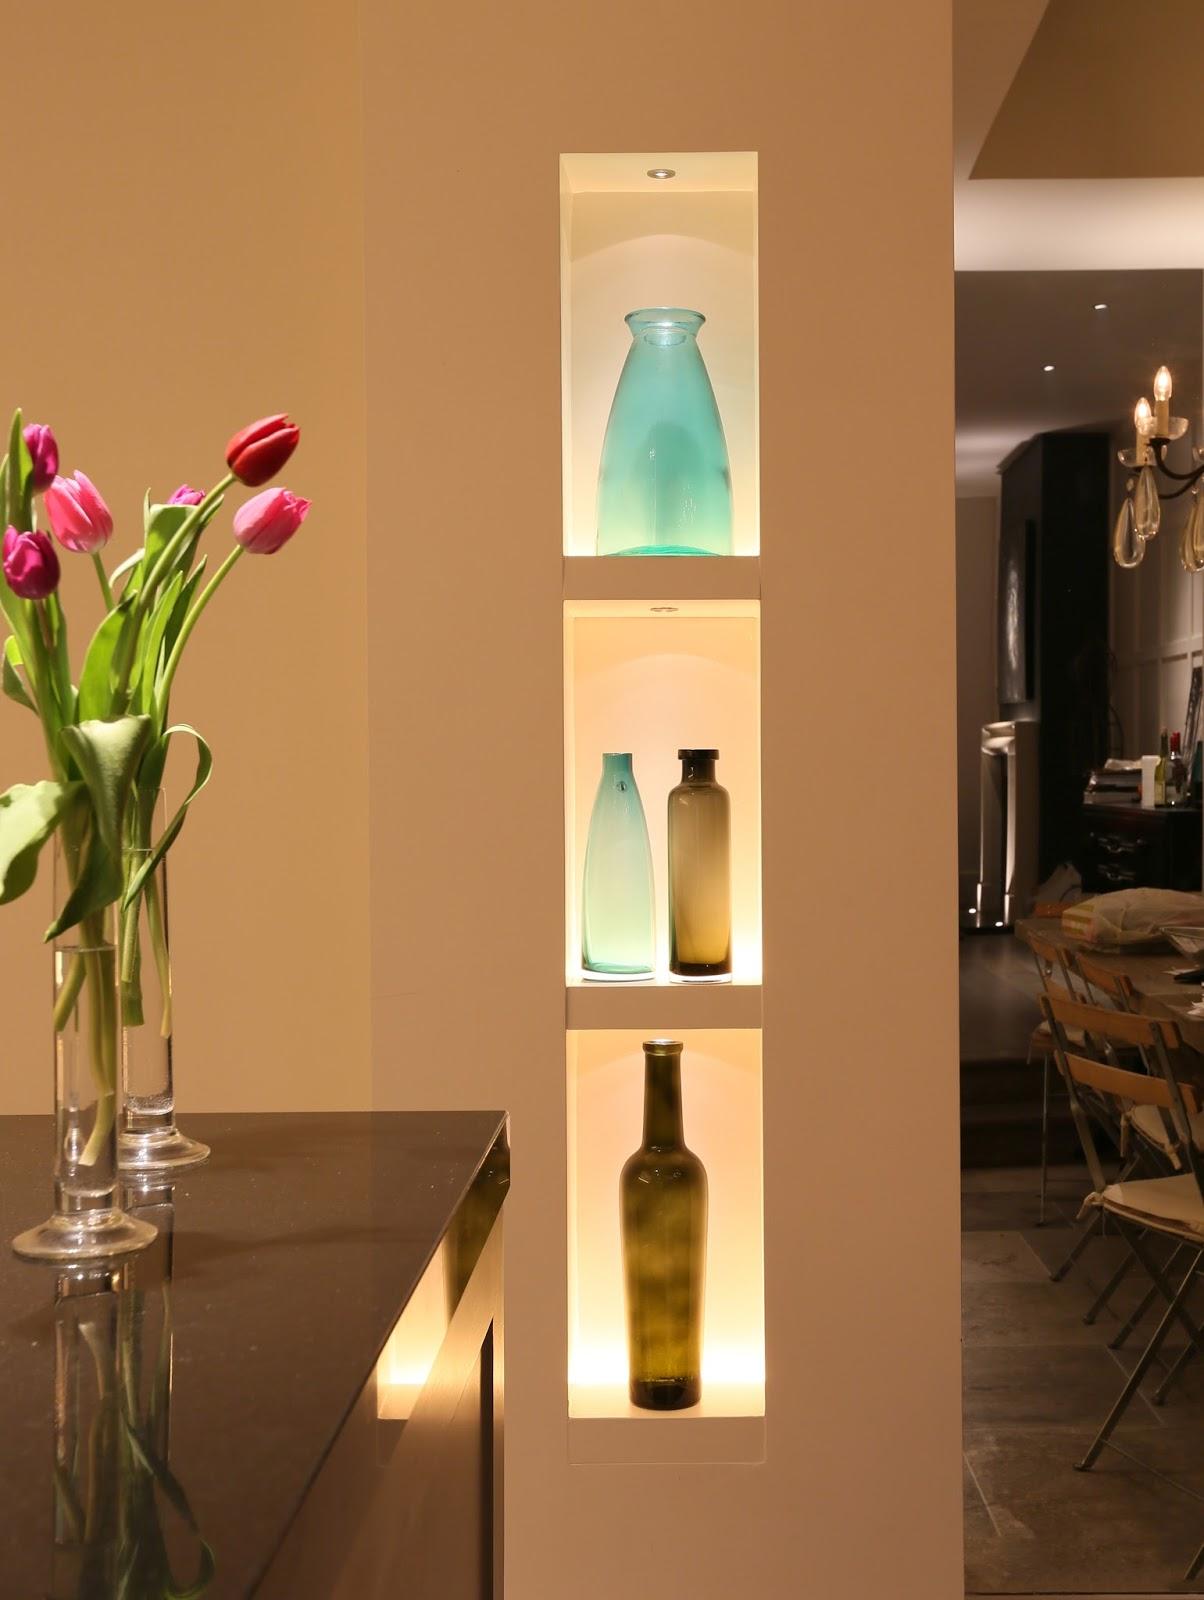 Lighting Basement Washroom Stairs: Top 10 Lighting Tips From Design Director Sally Storey